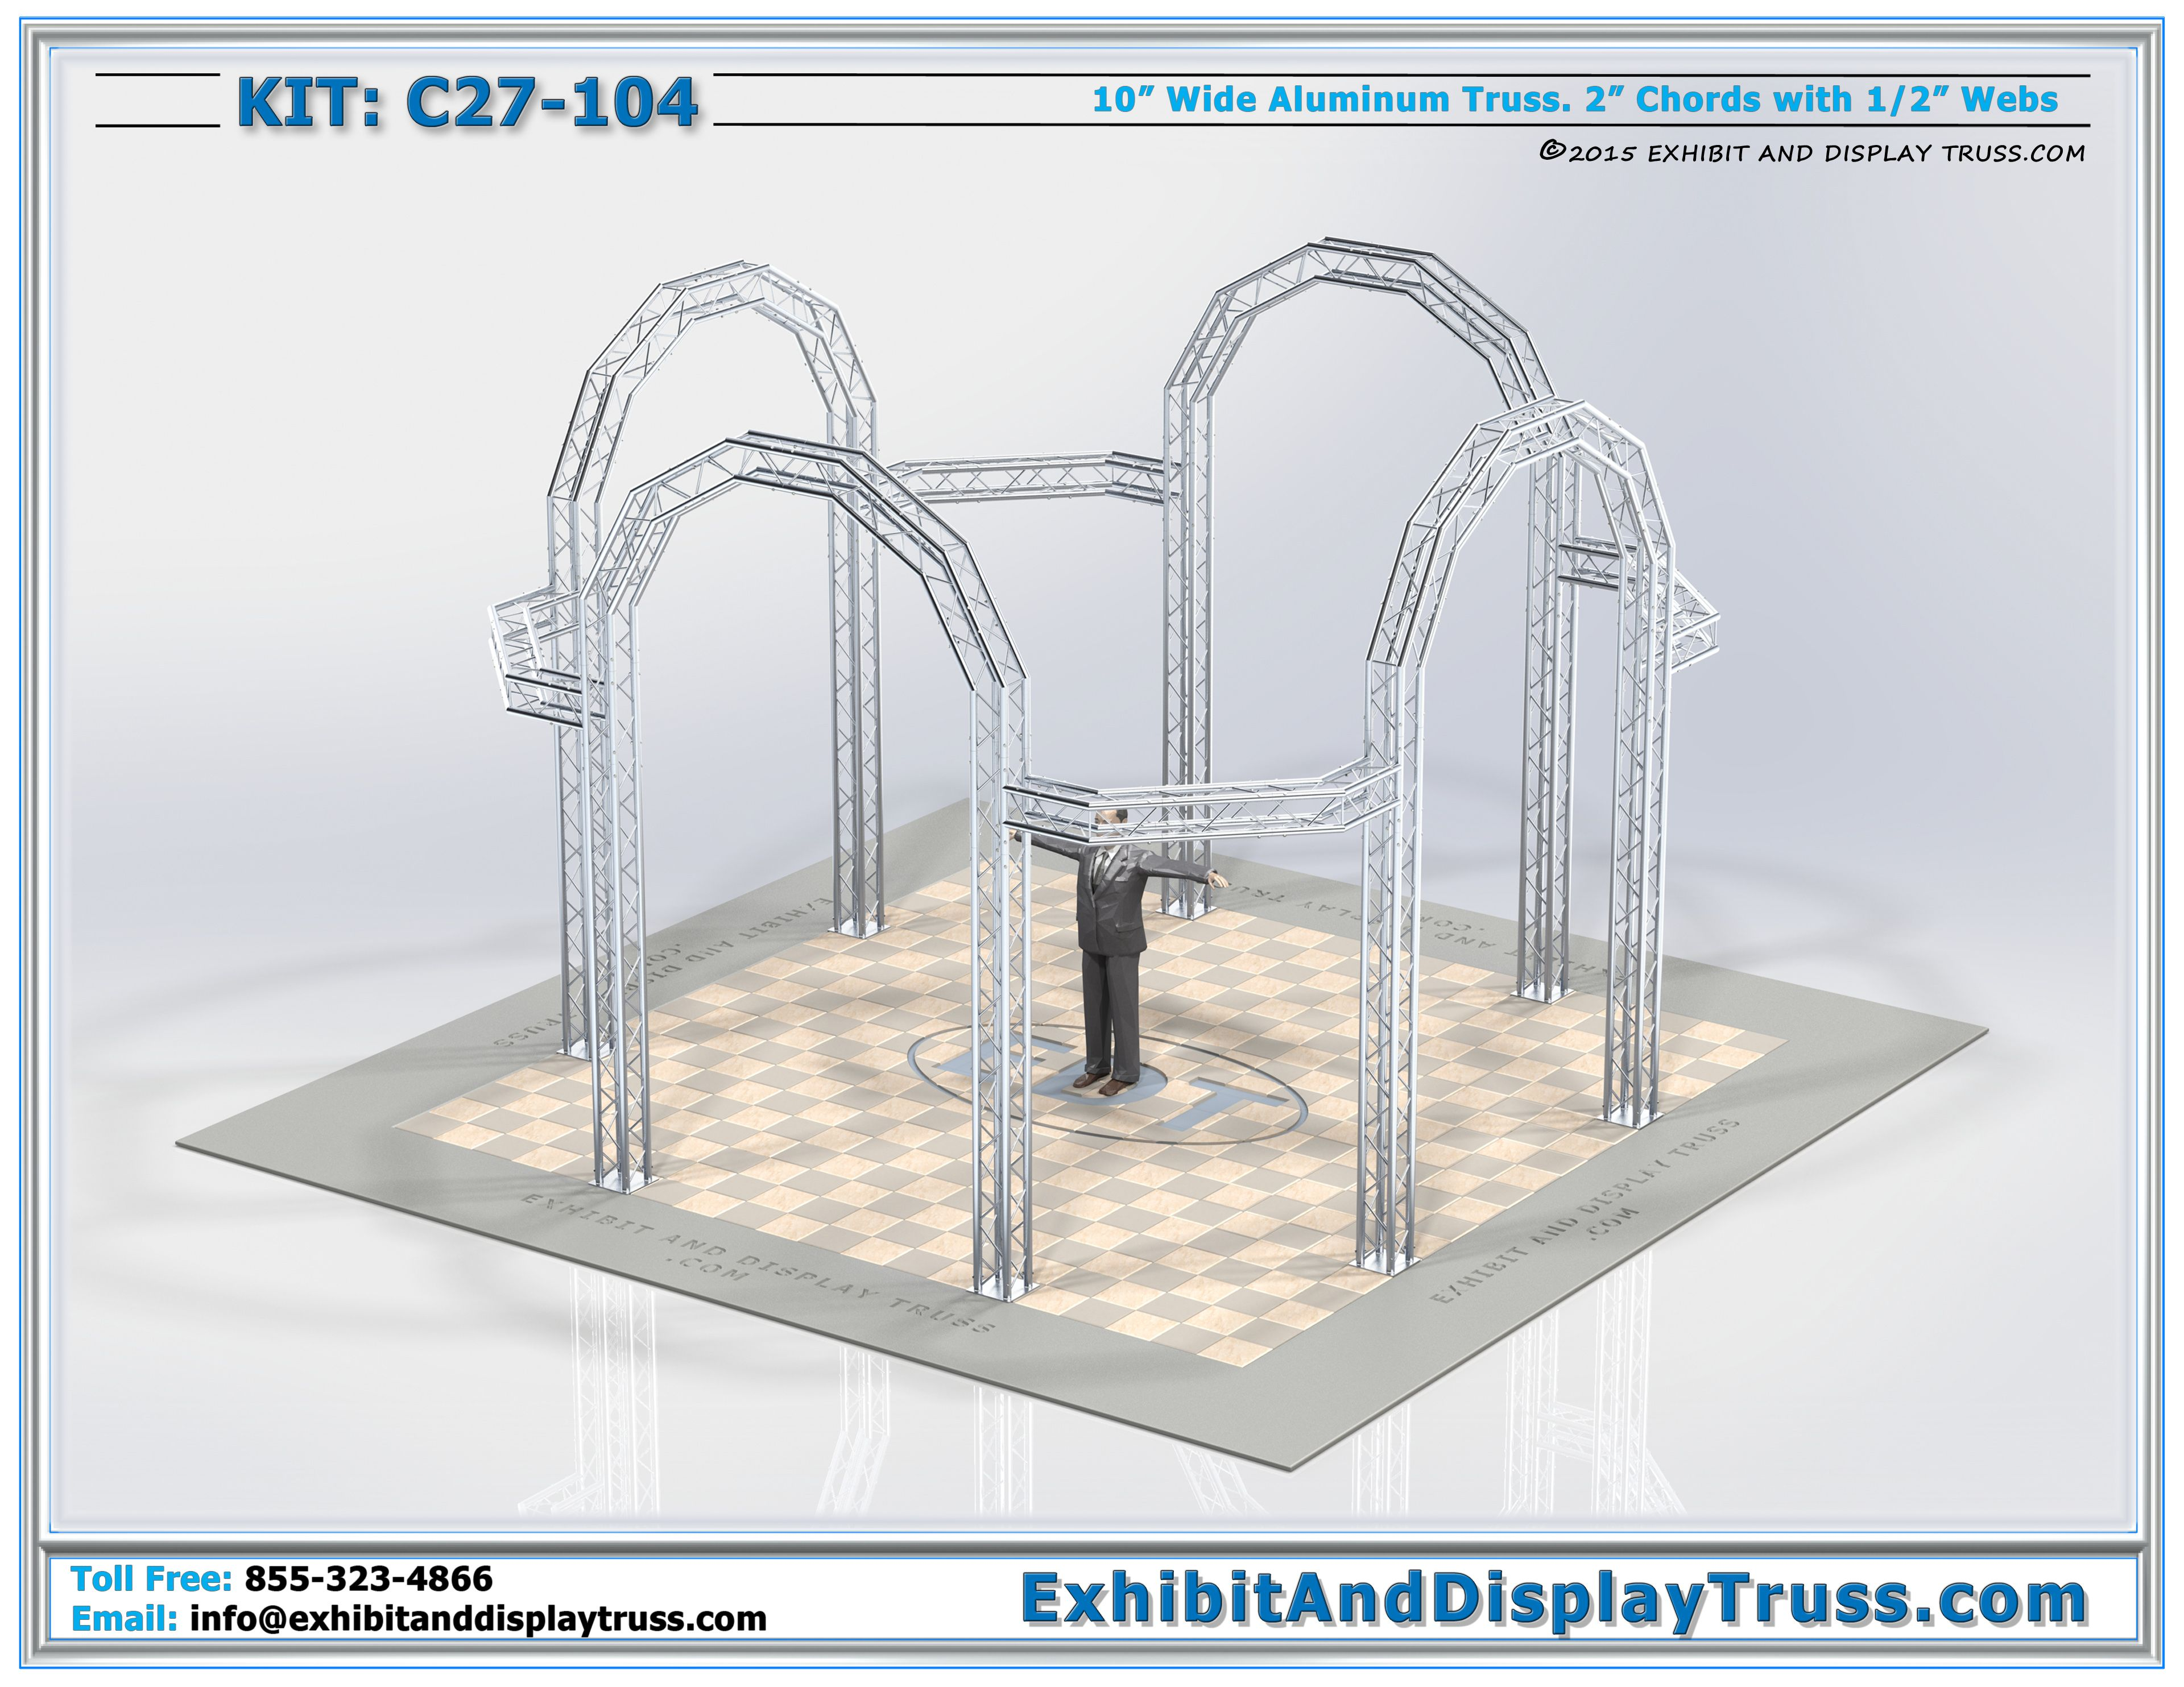 exhibit display kit c27 104 modern truss display exhibit with truss